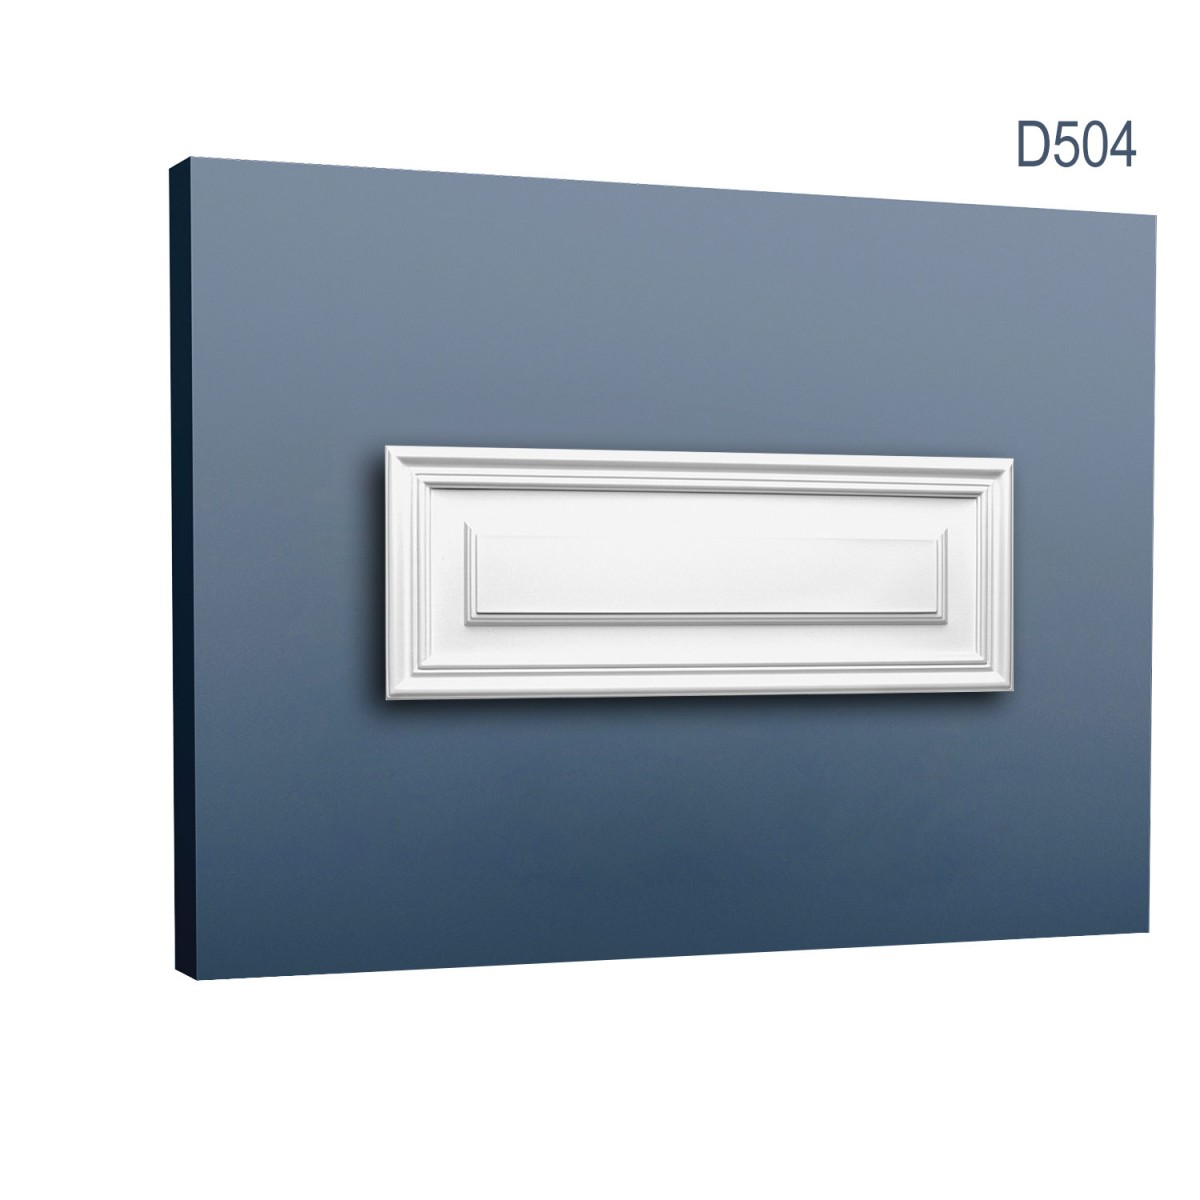 Panou Usa Luxxus D504, Dimensiuni: 55 X 22 X 1.7 cm, Orac Decor